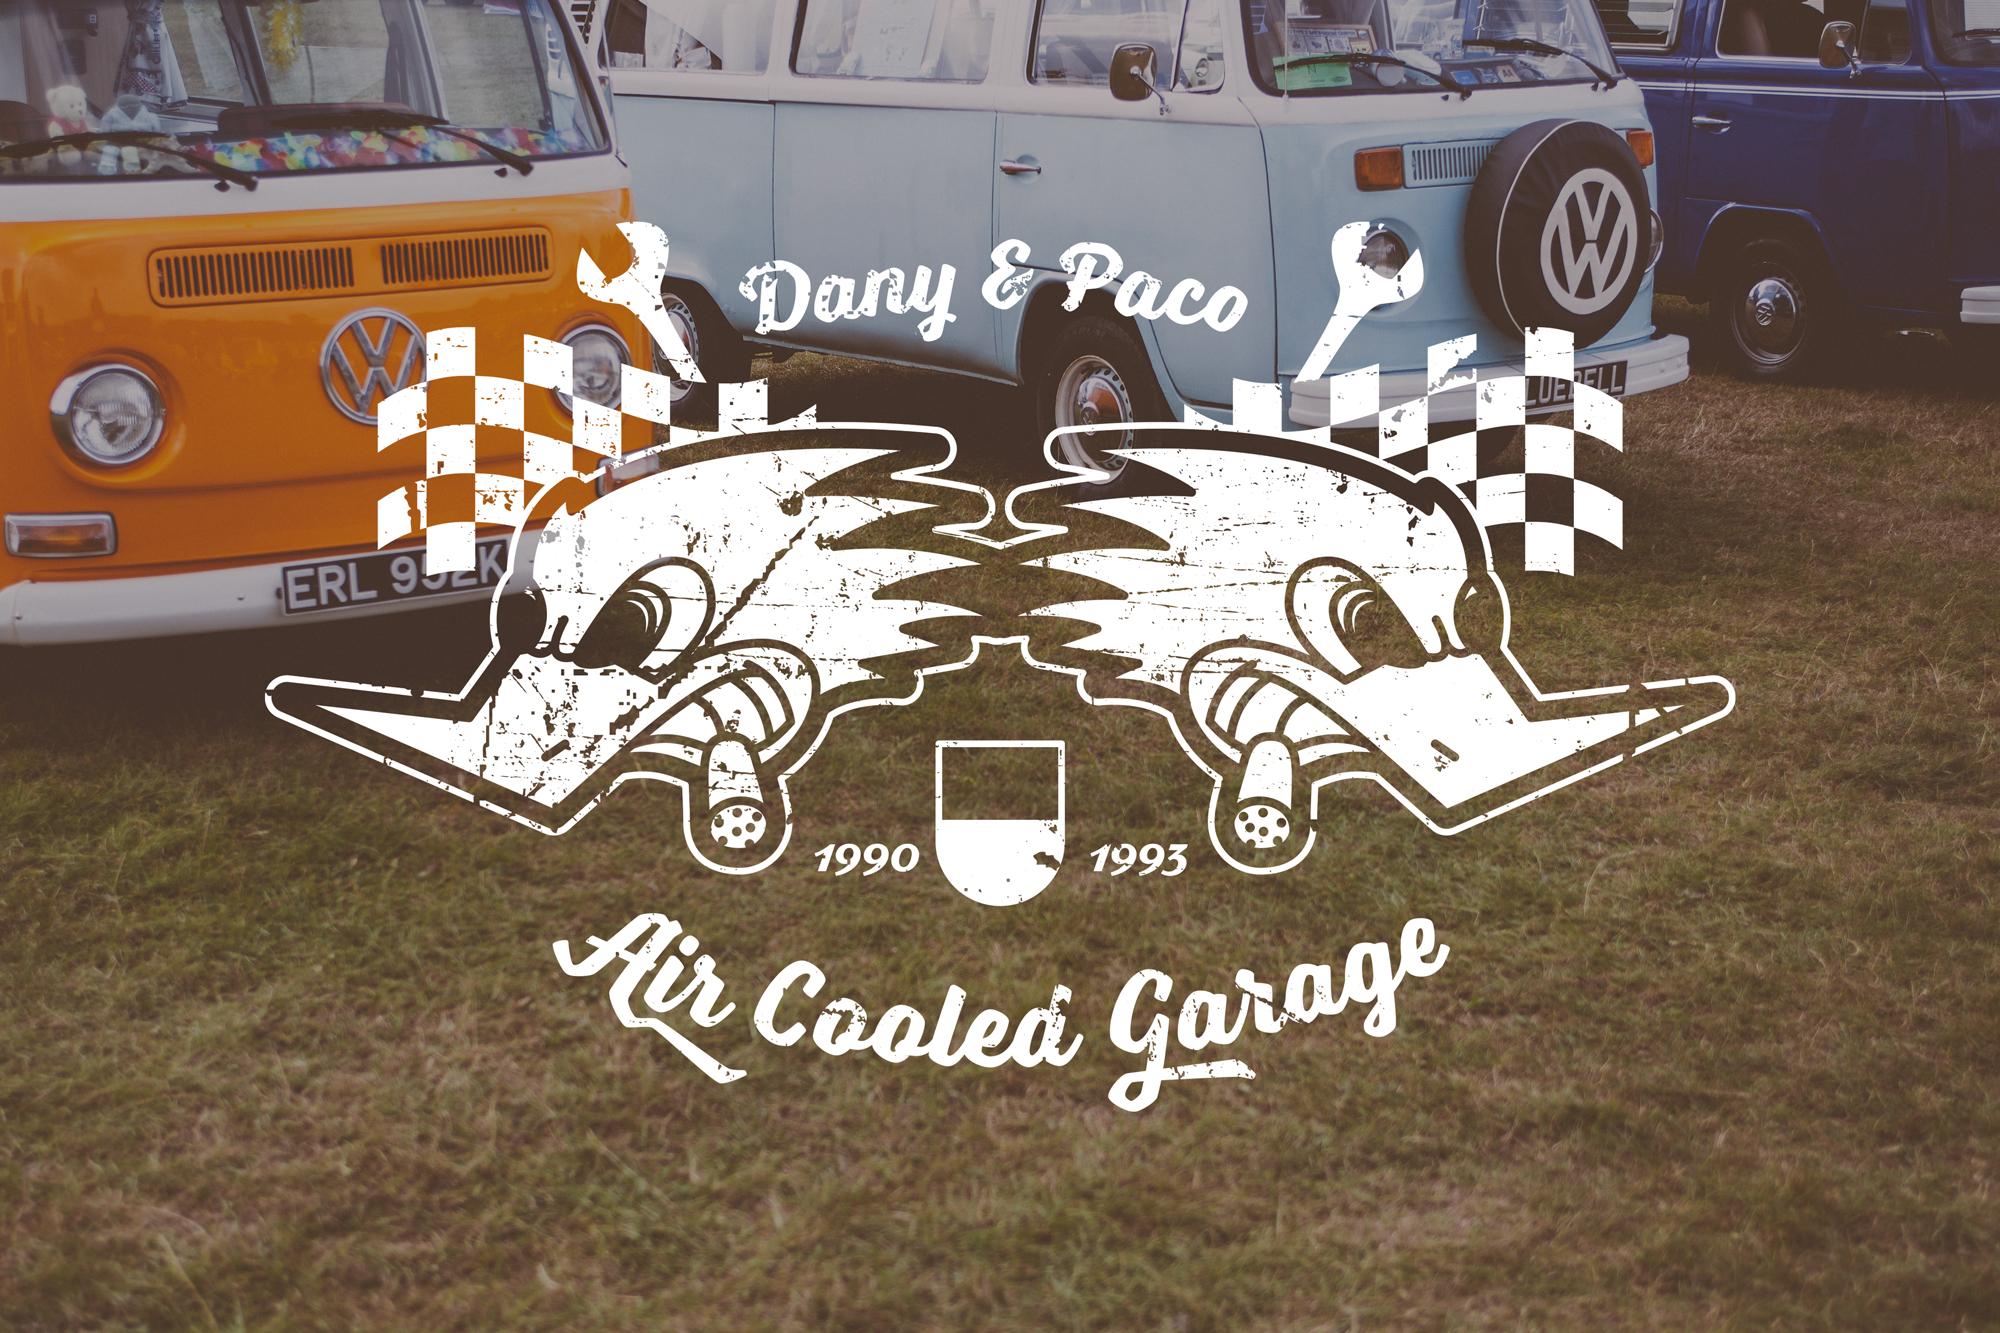 Air Cooled Garage Identité